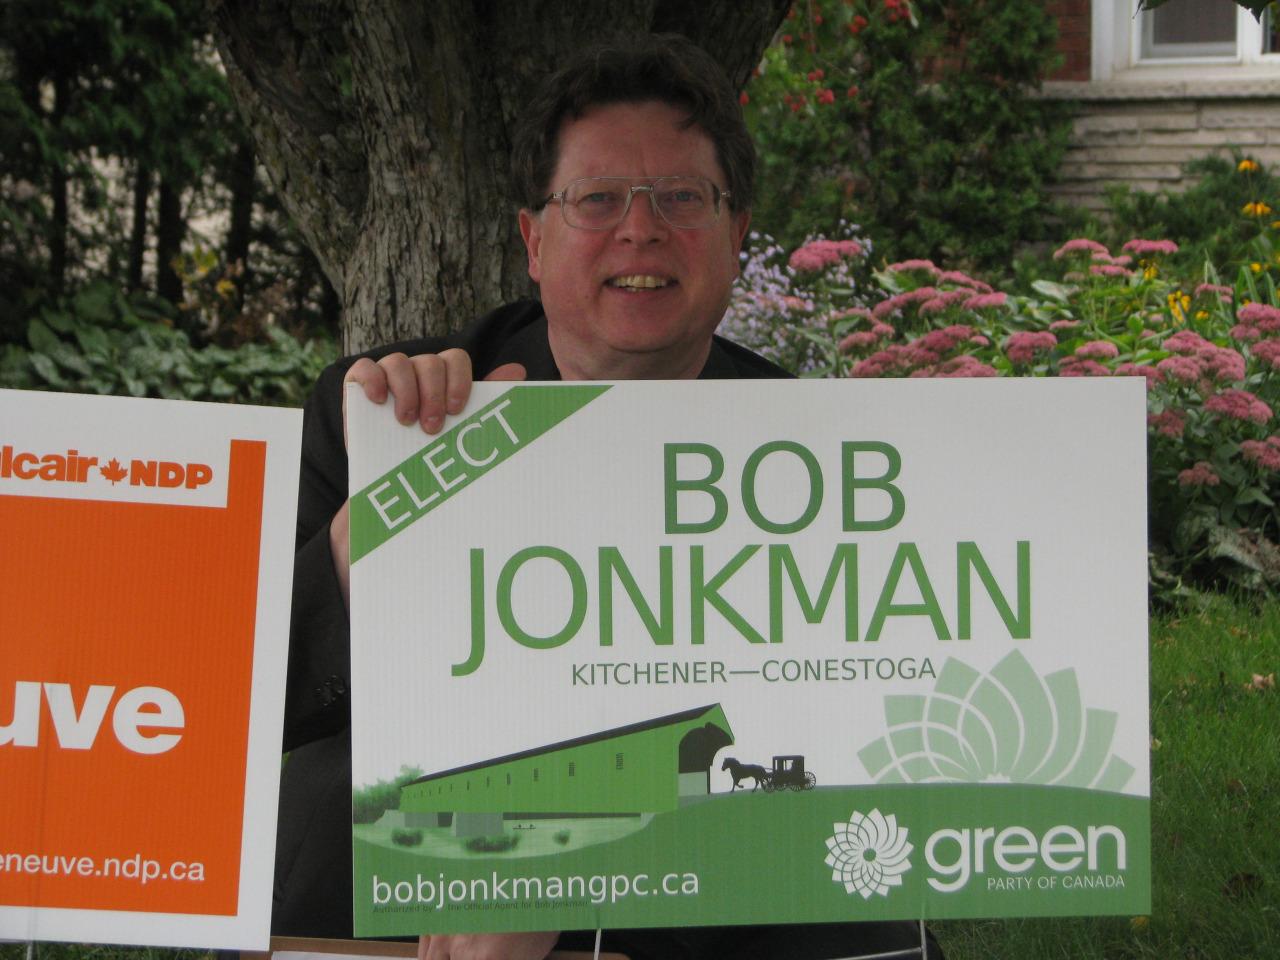 Bob and his sign